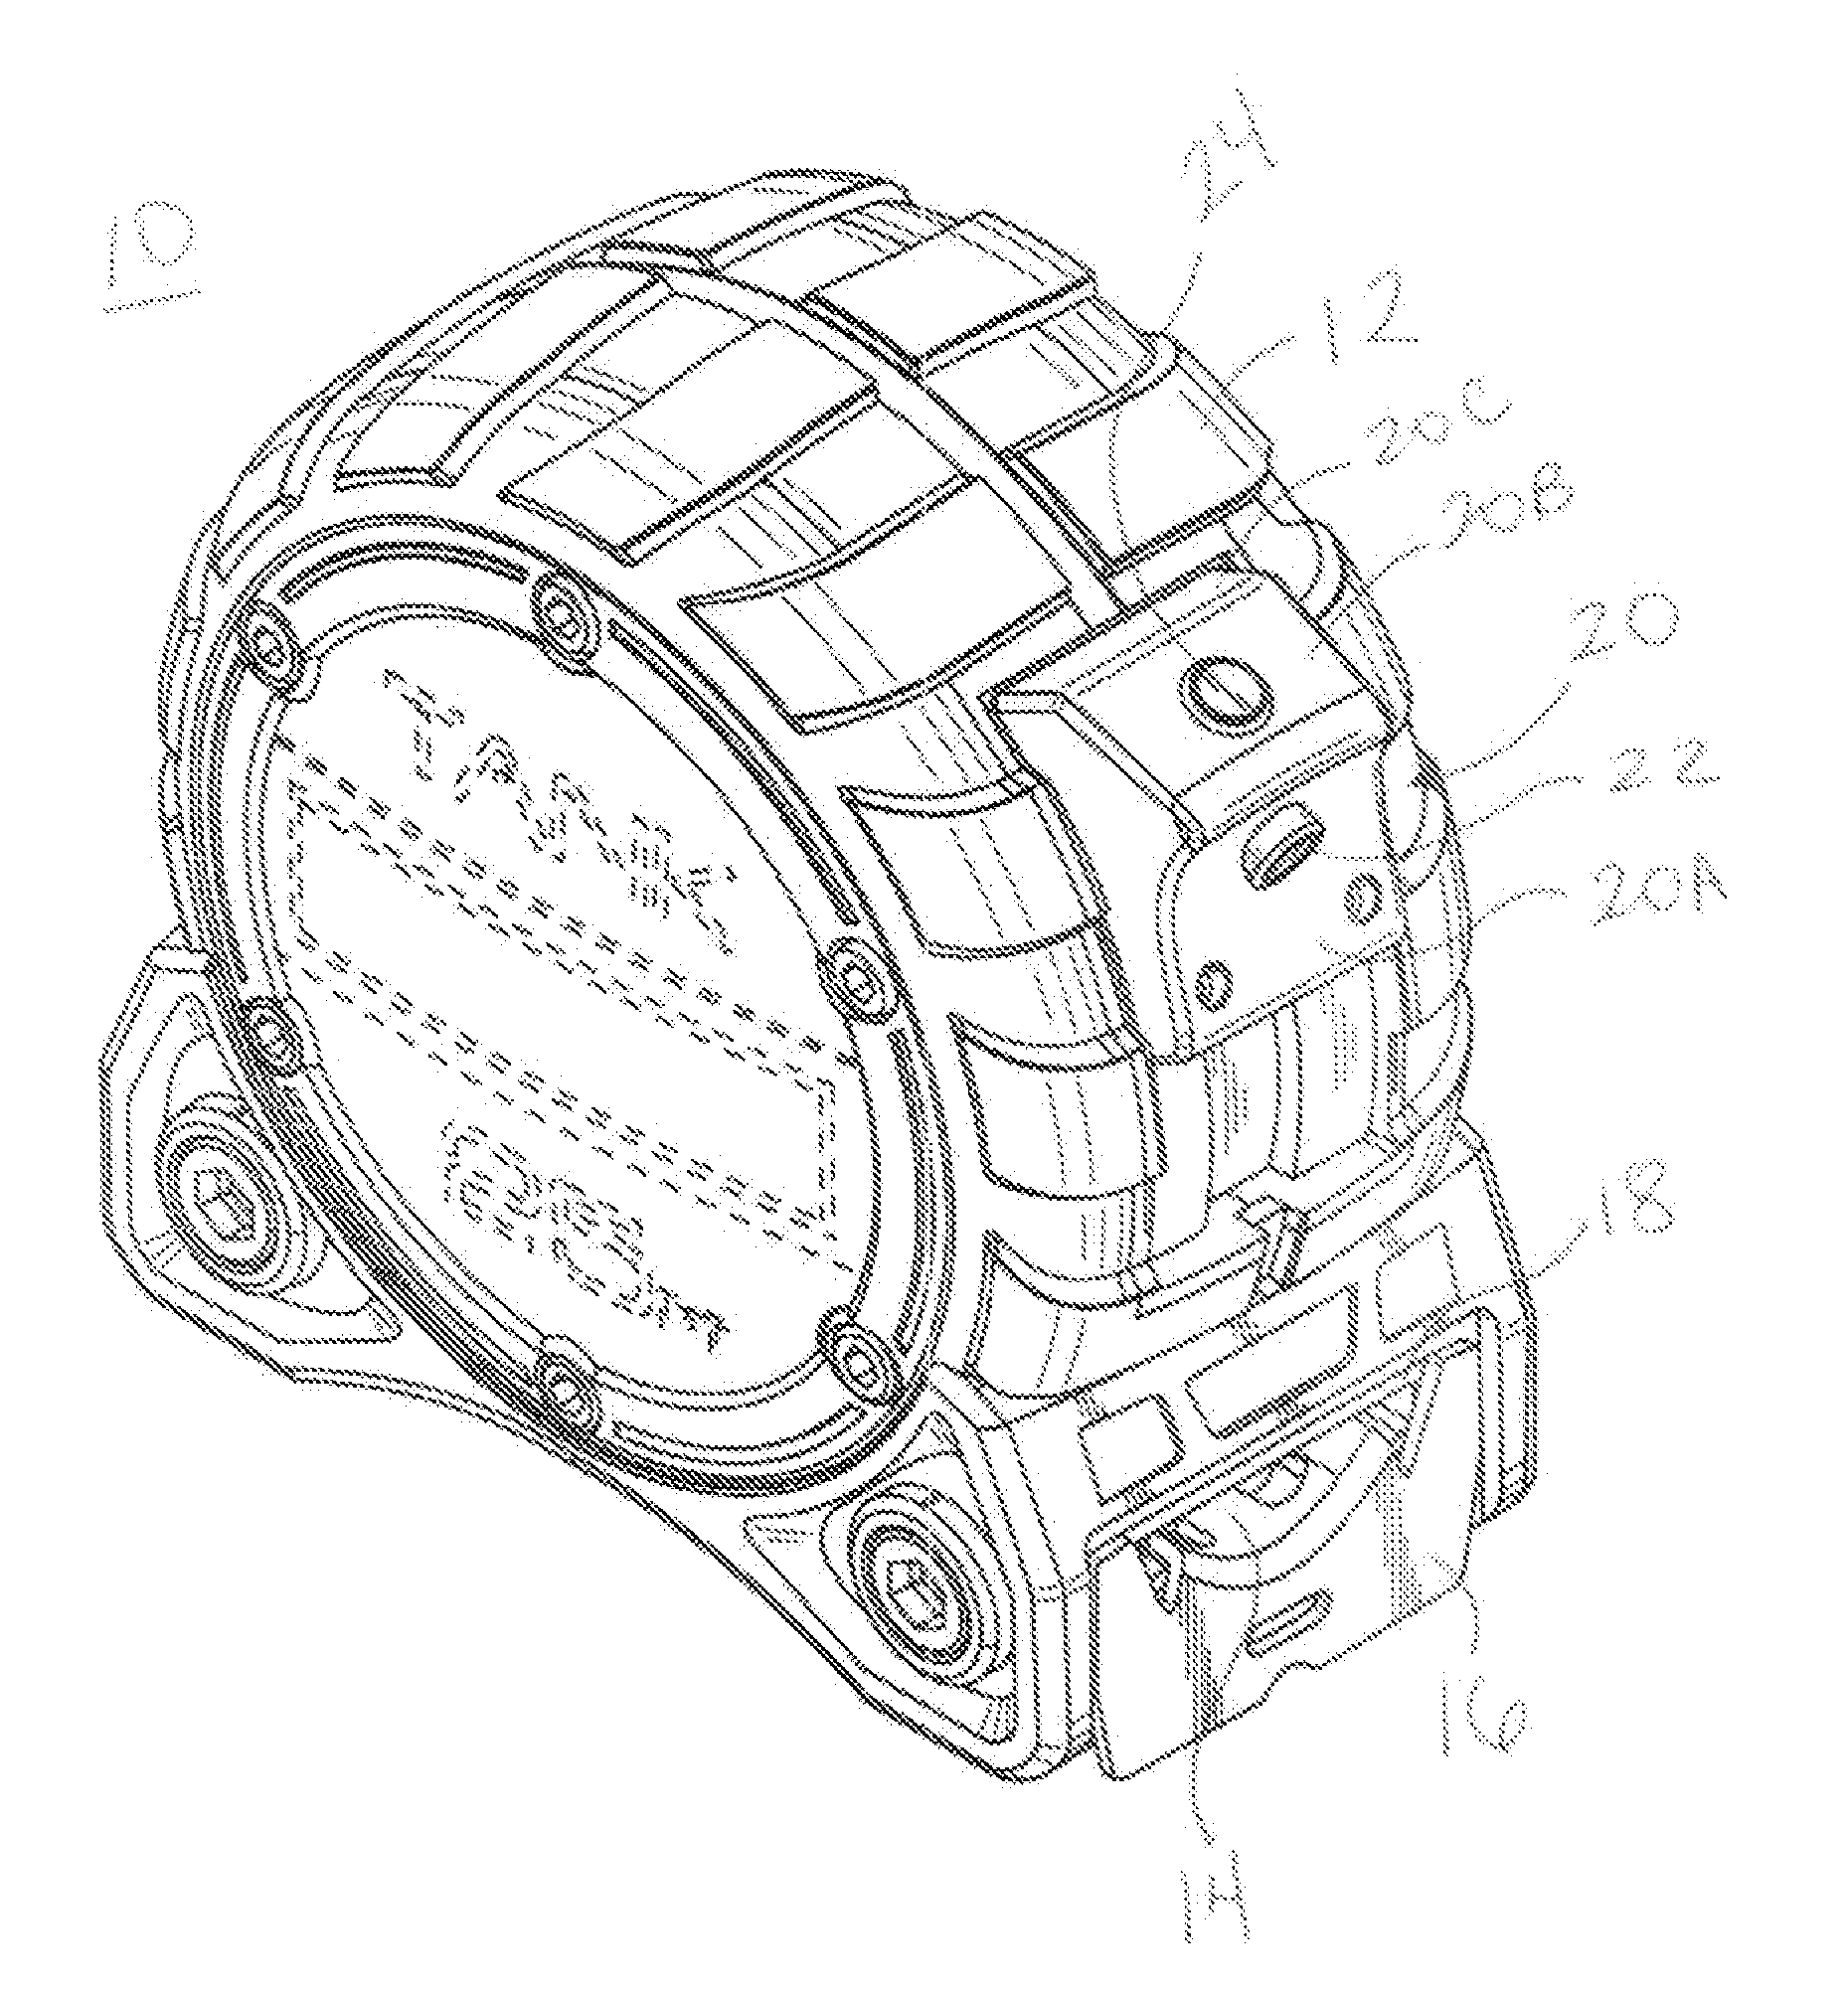 pin tape measure diagram on pinterest